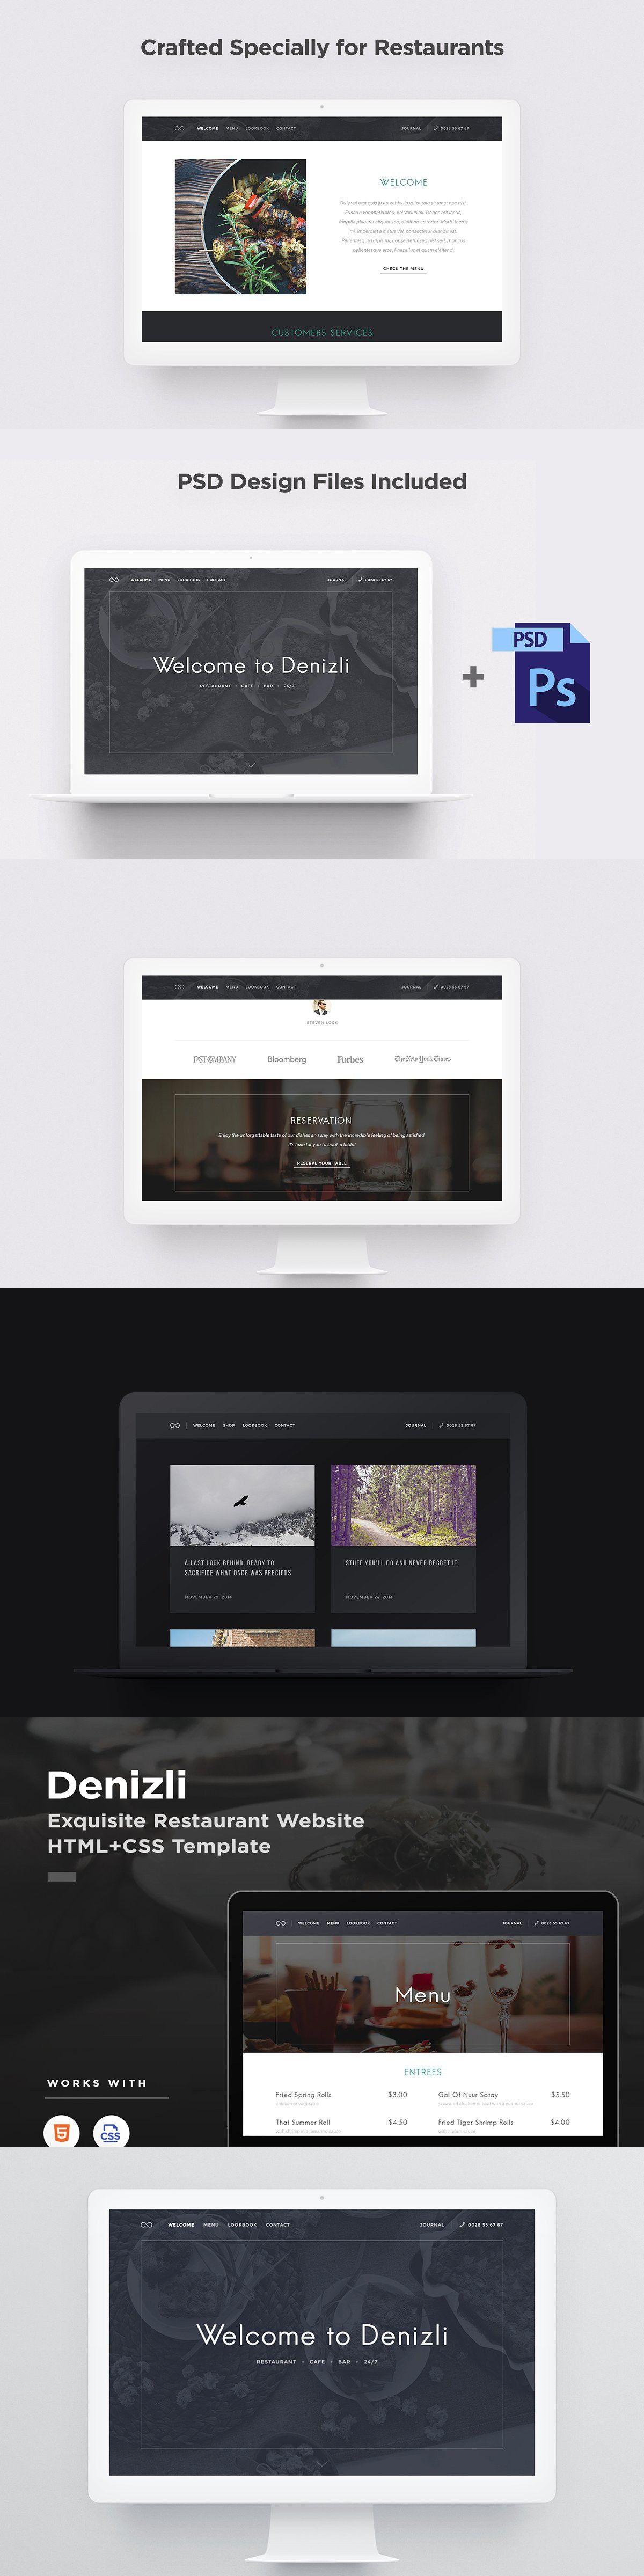 Denizli Restaurant HTML Template Psd designs